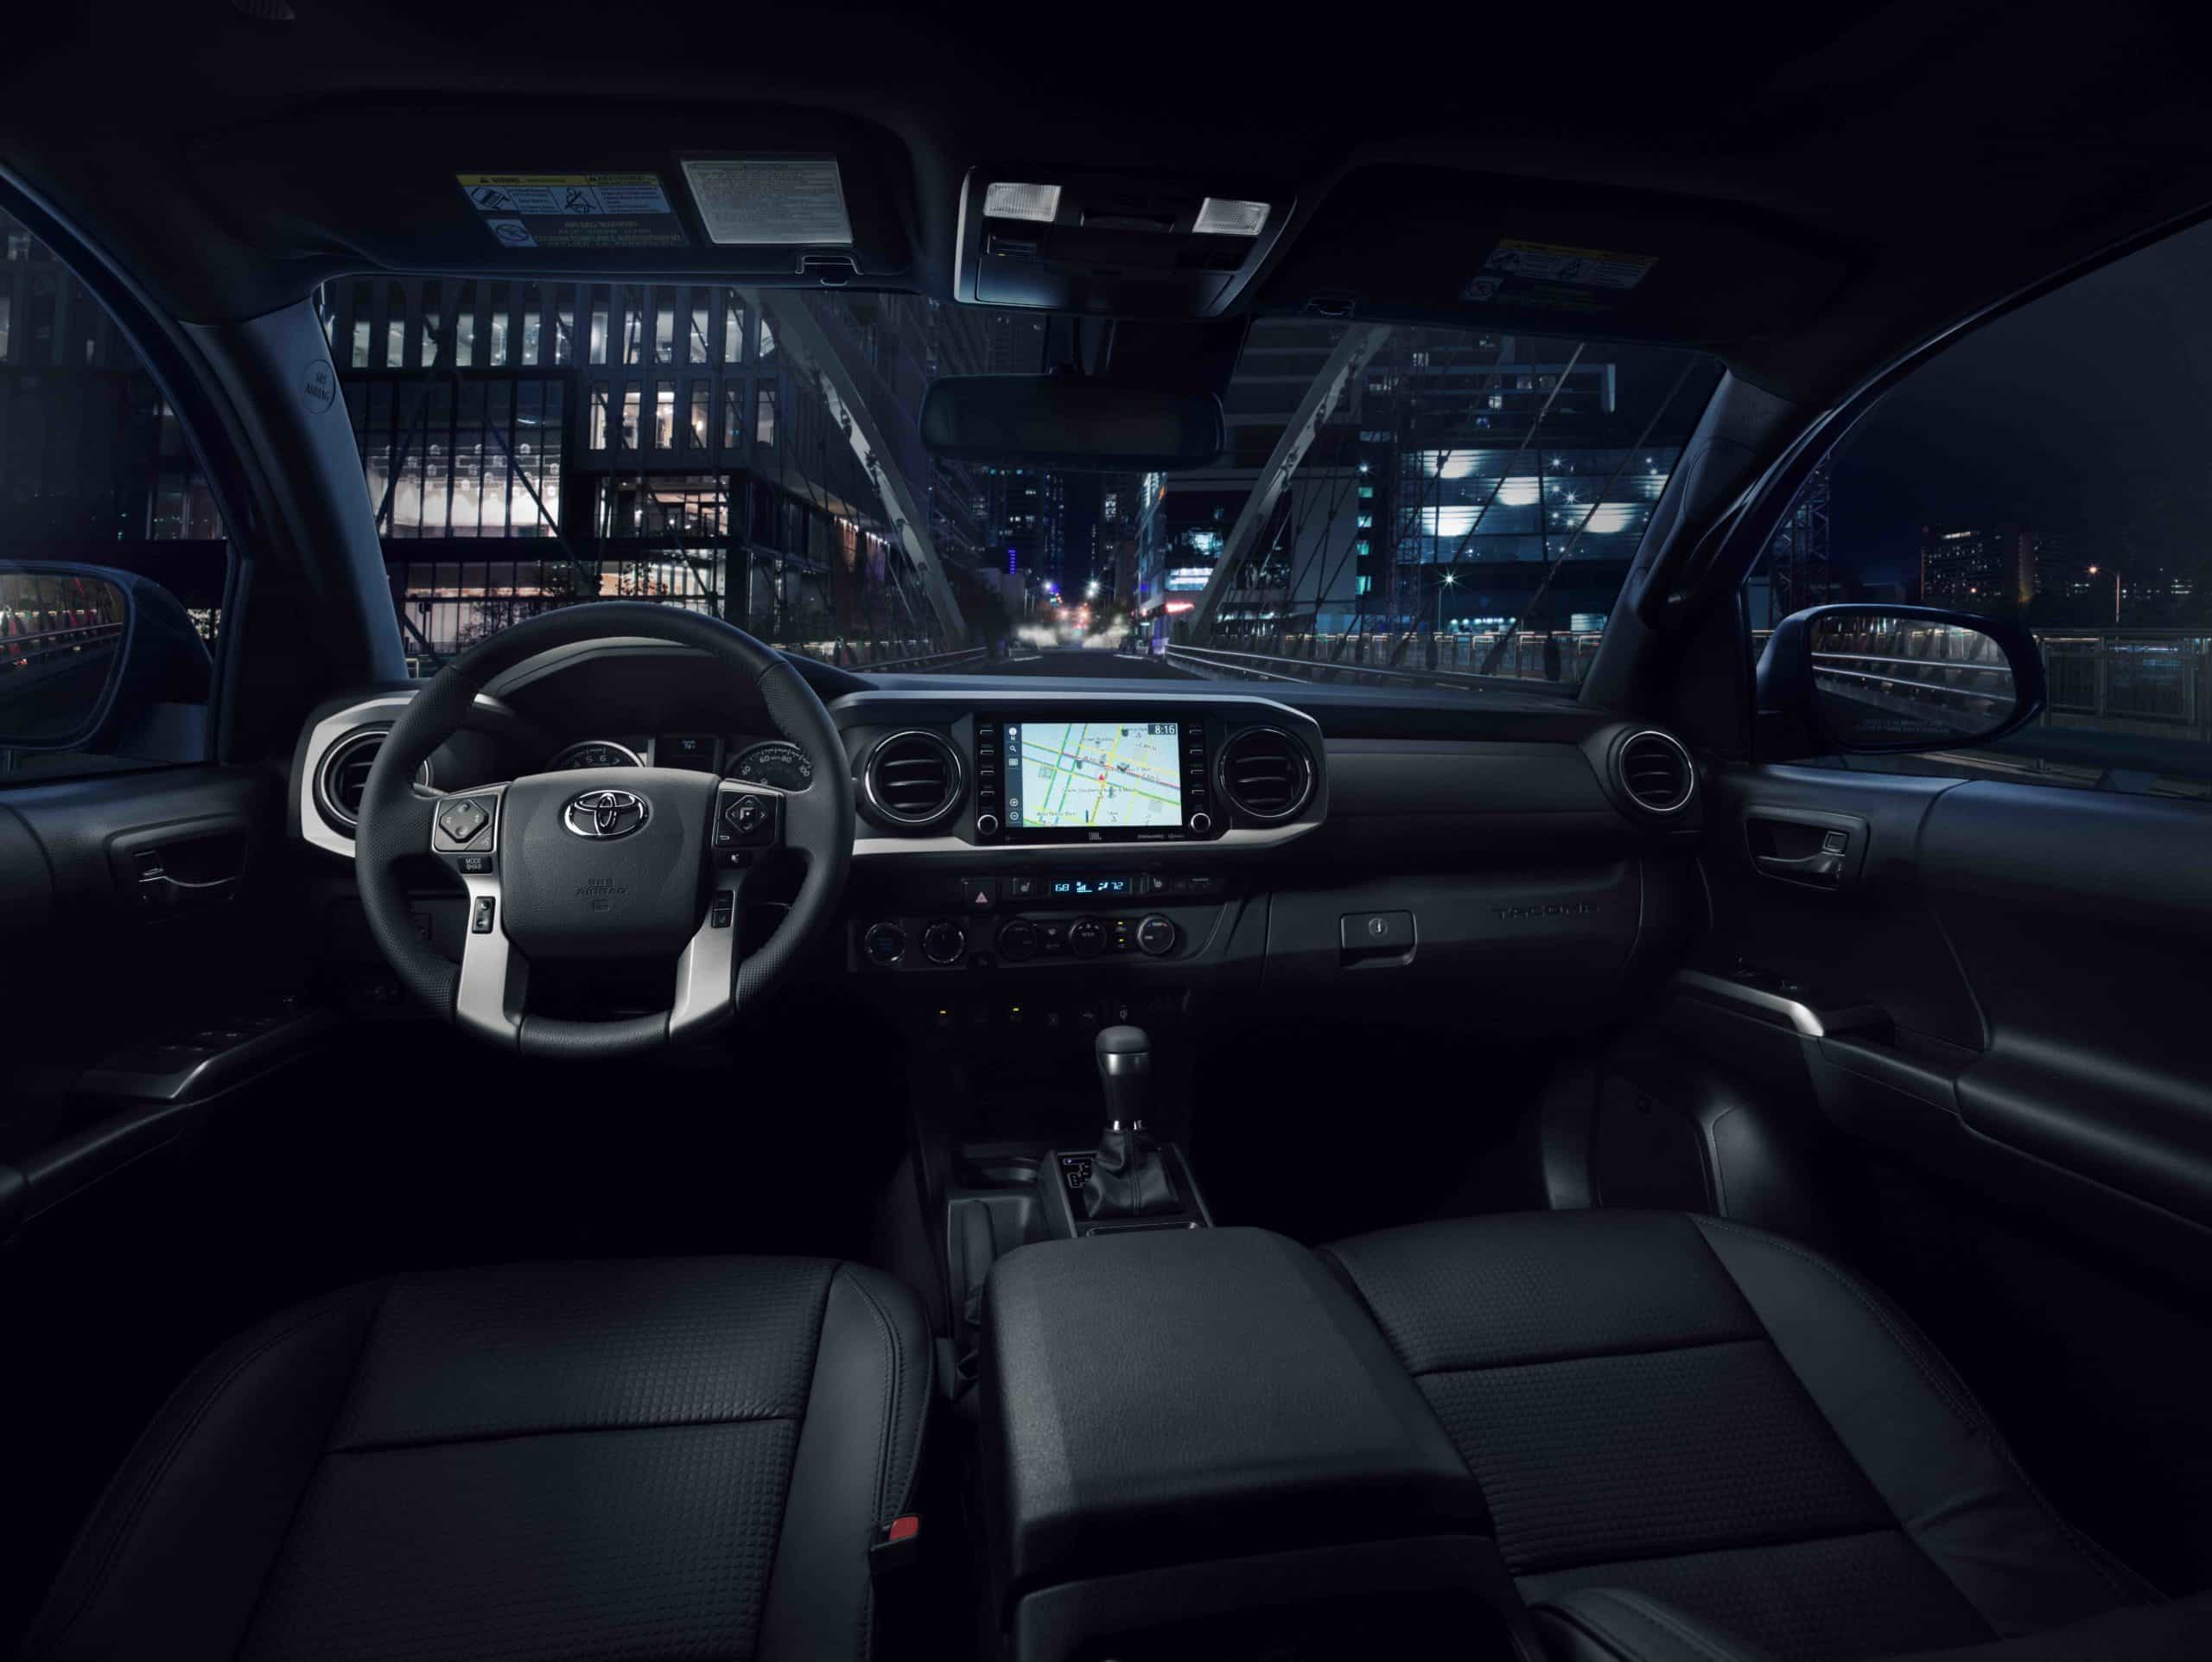 2021 Toyota Tacoma Nightshade interior